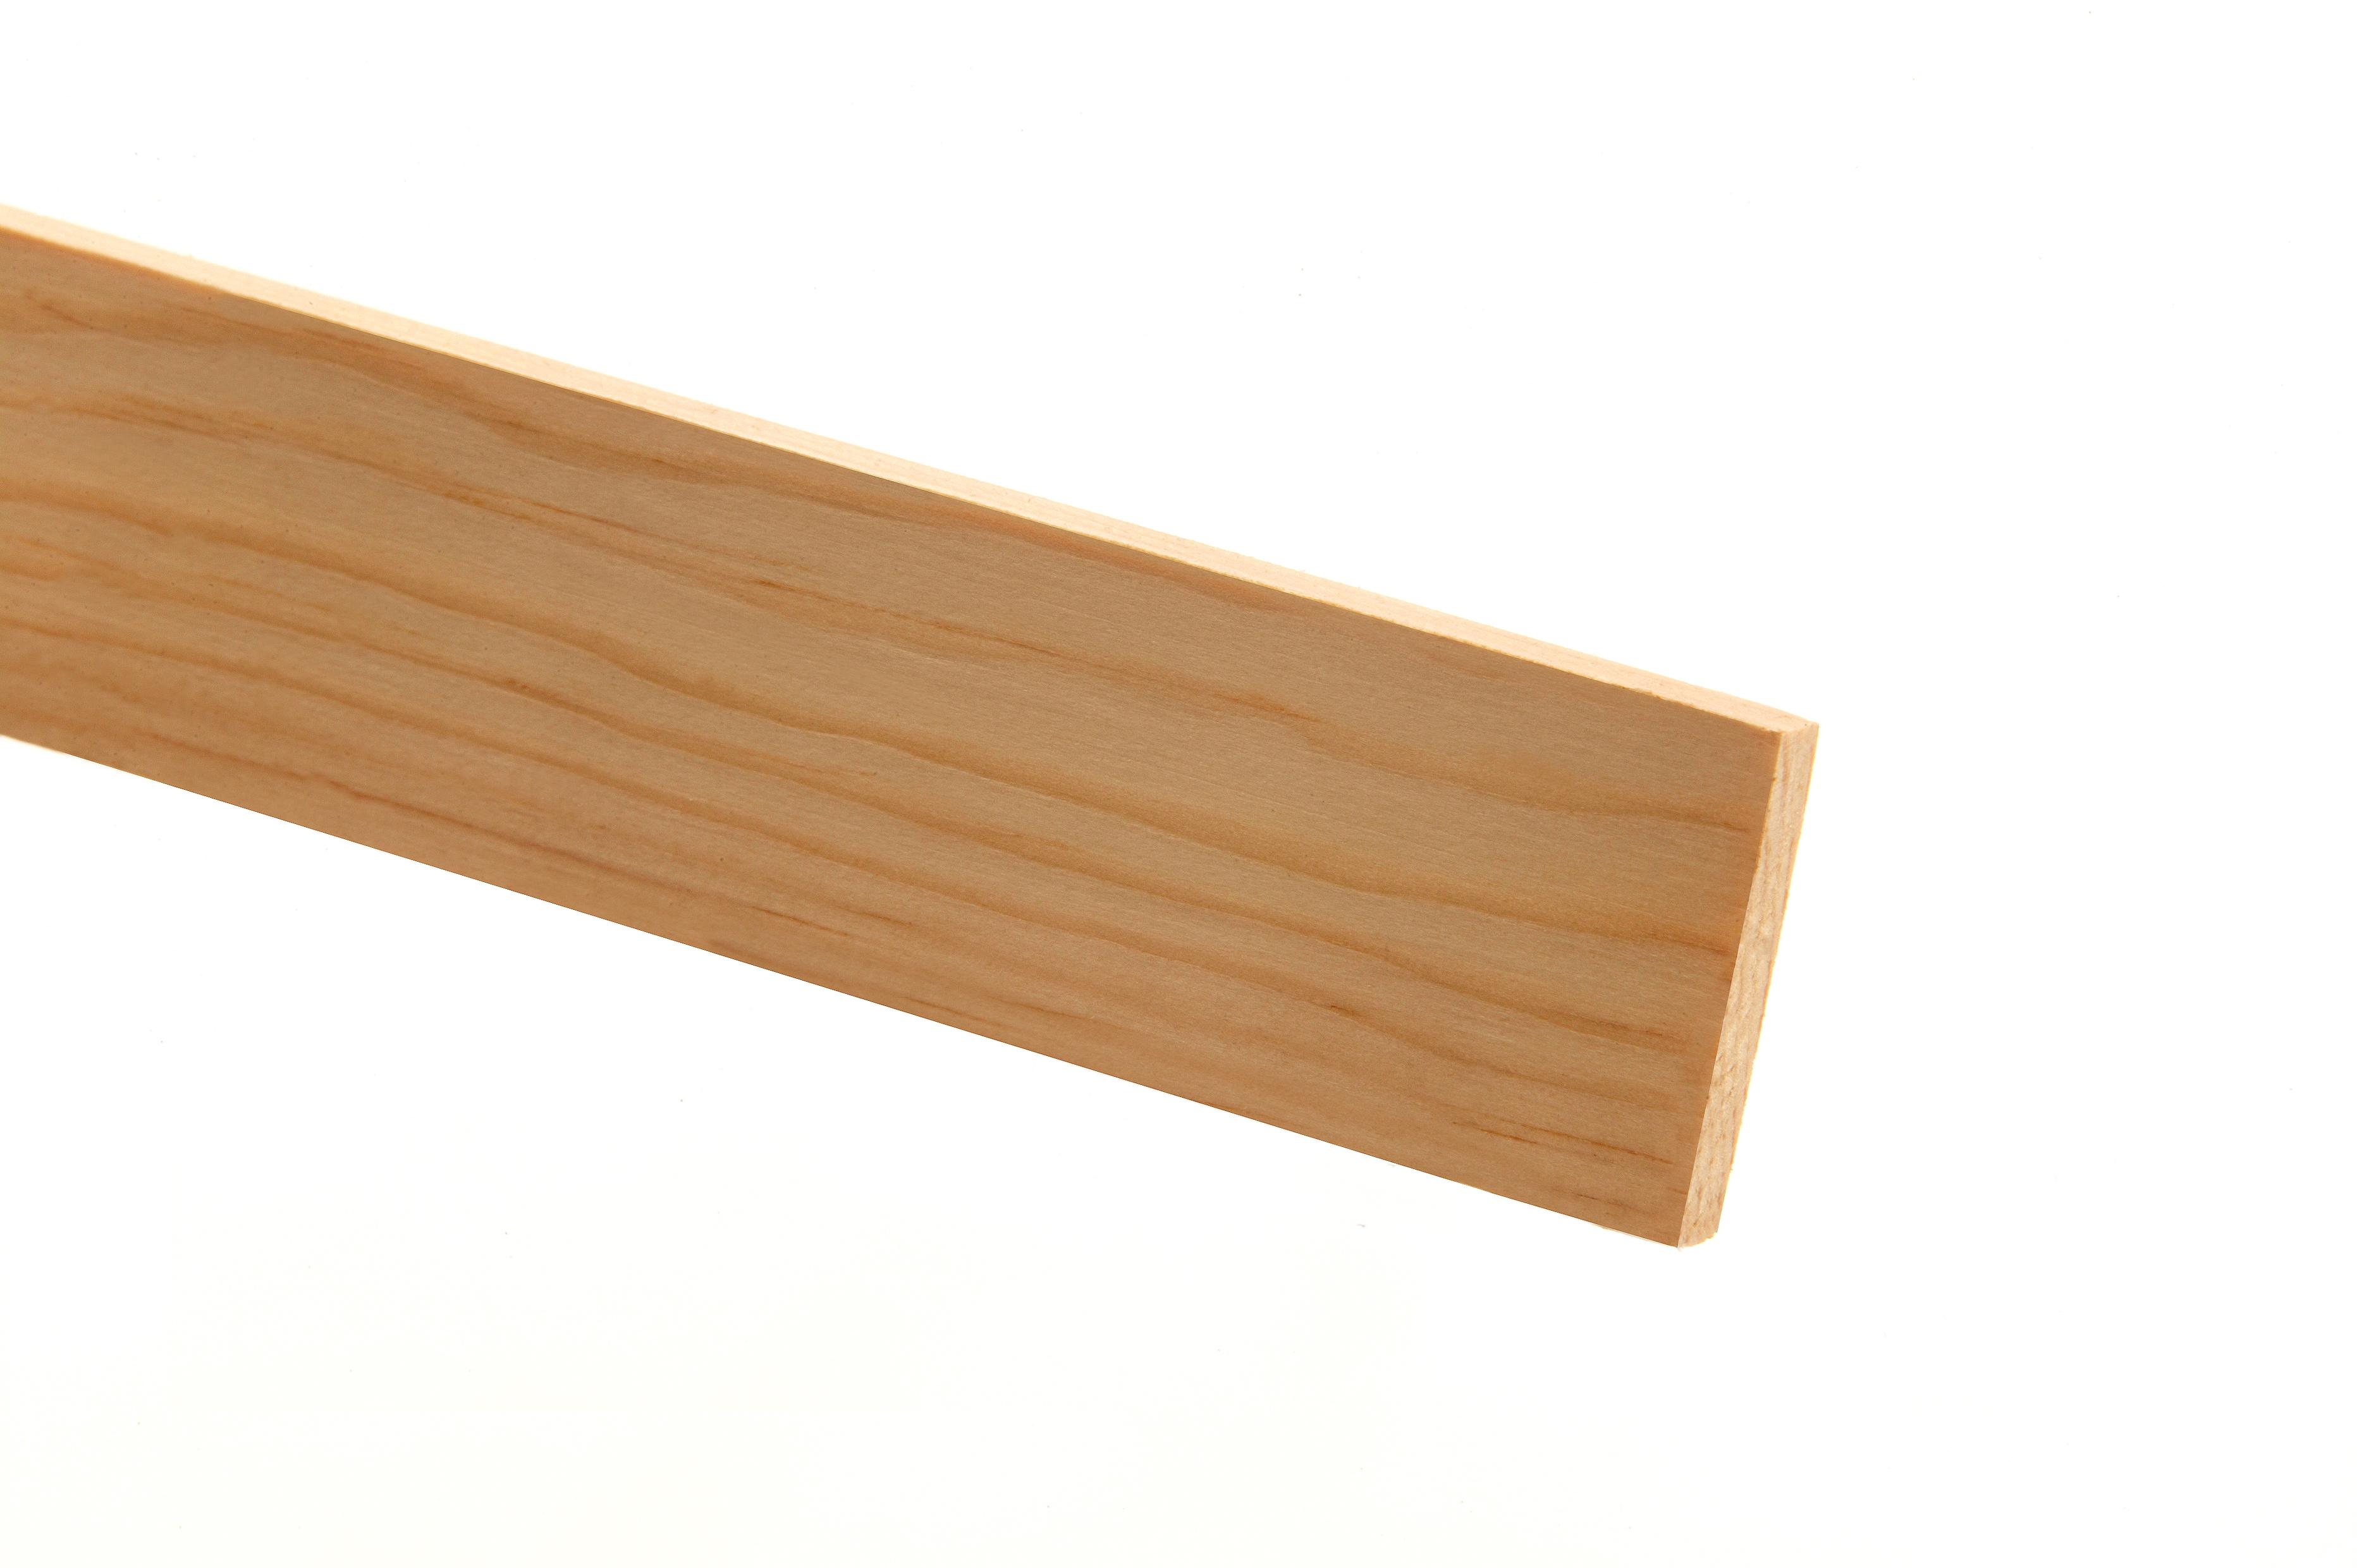 20 Pine PSE Stripwood 6 x 18 x 2400mm